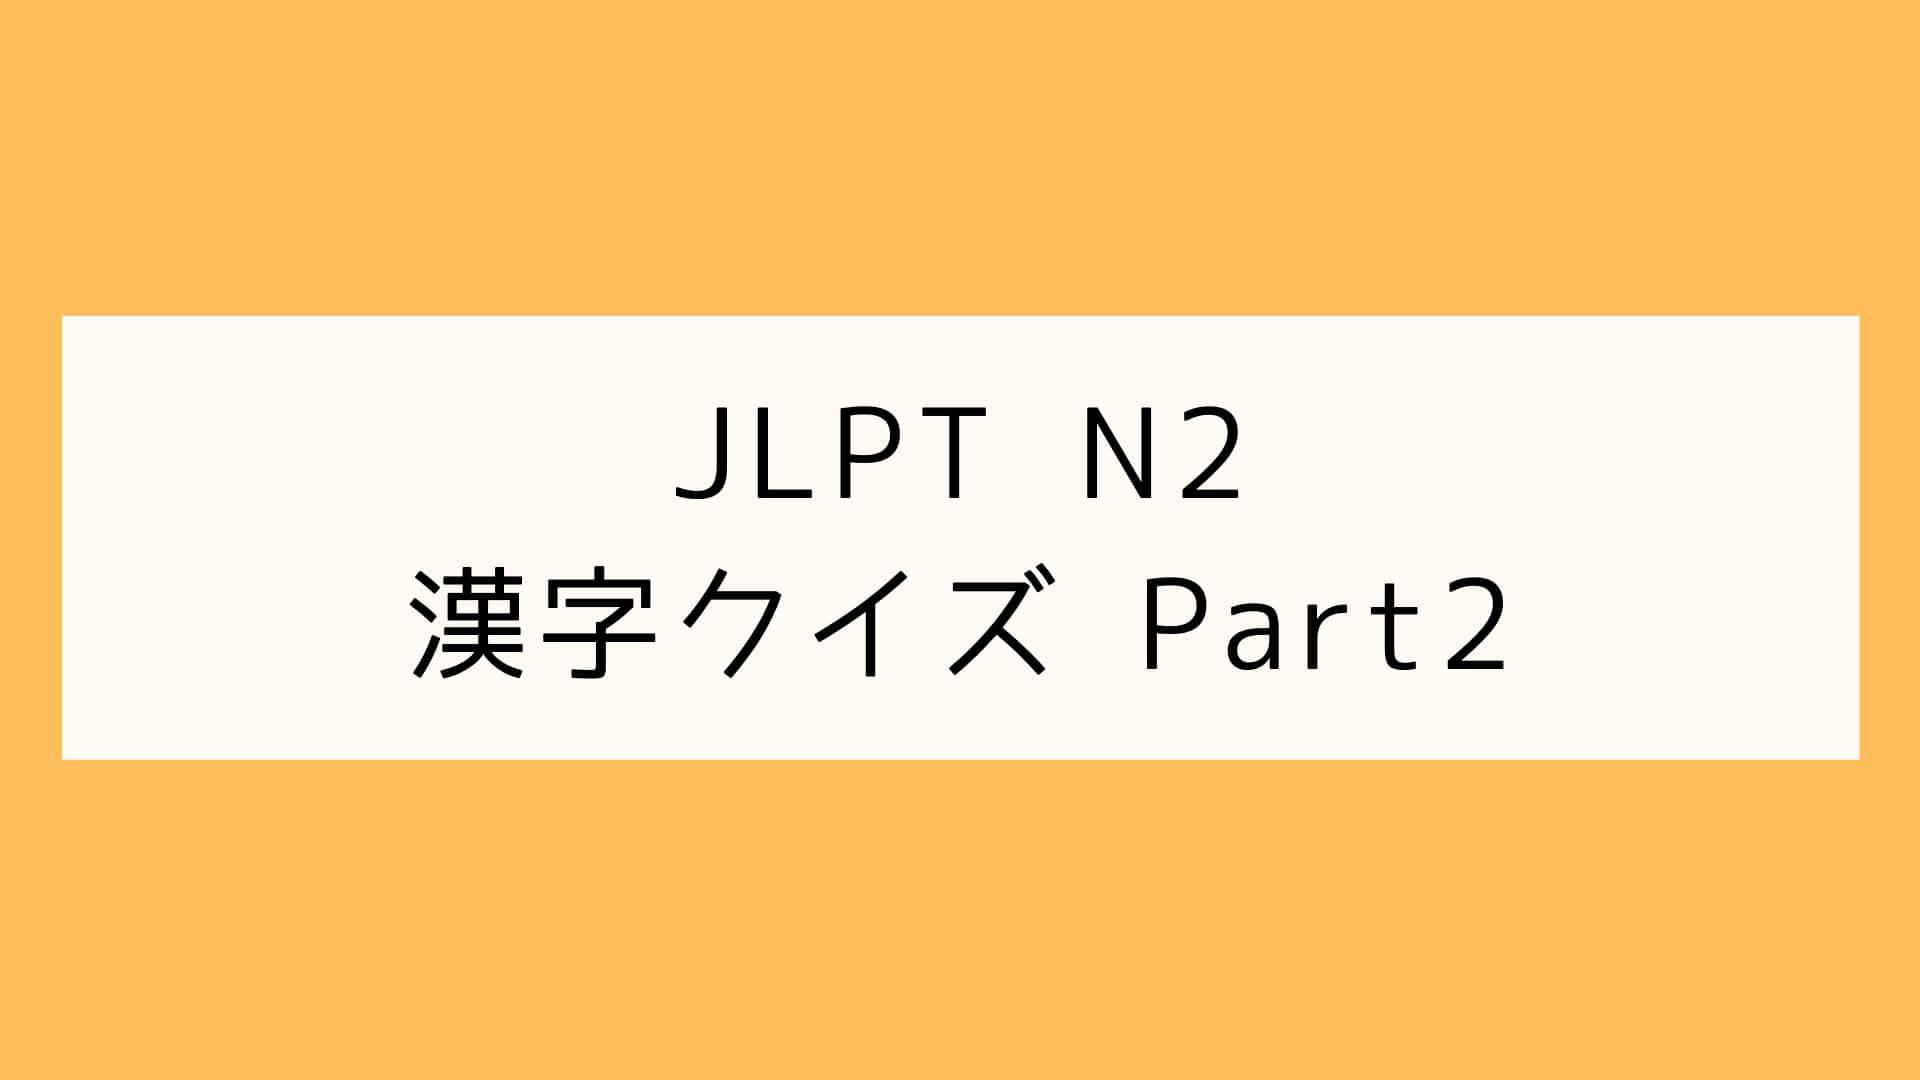 【JLPT N2】漢字クイズ Part2